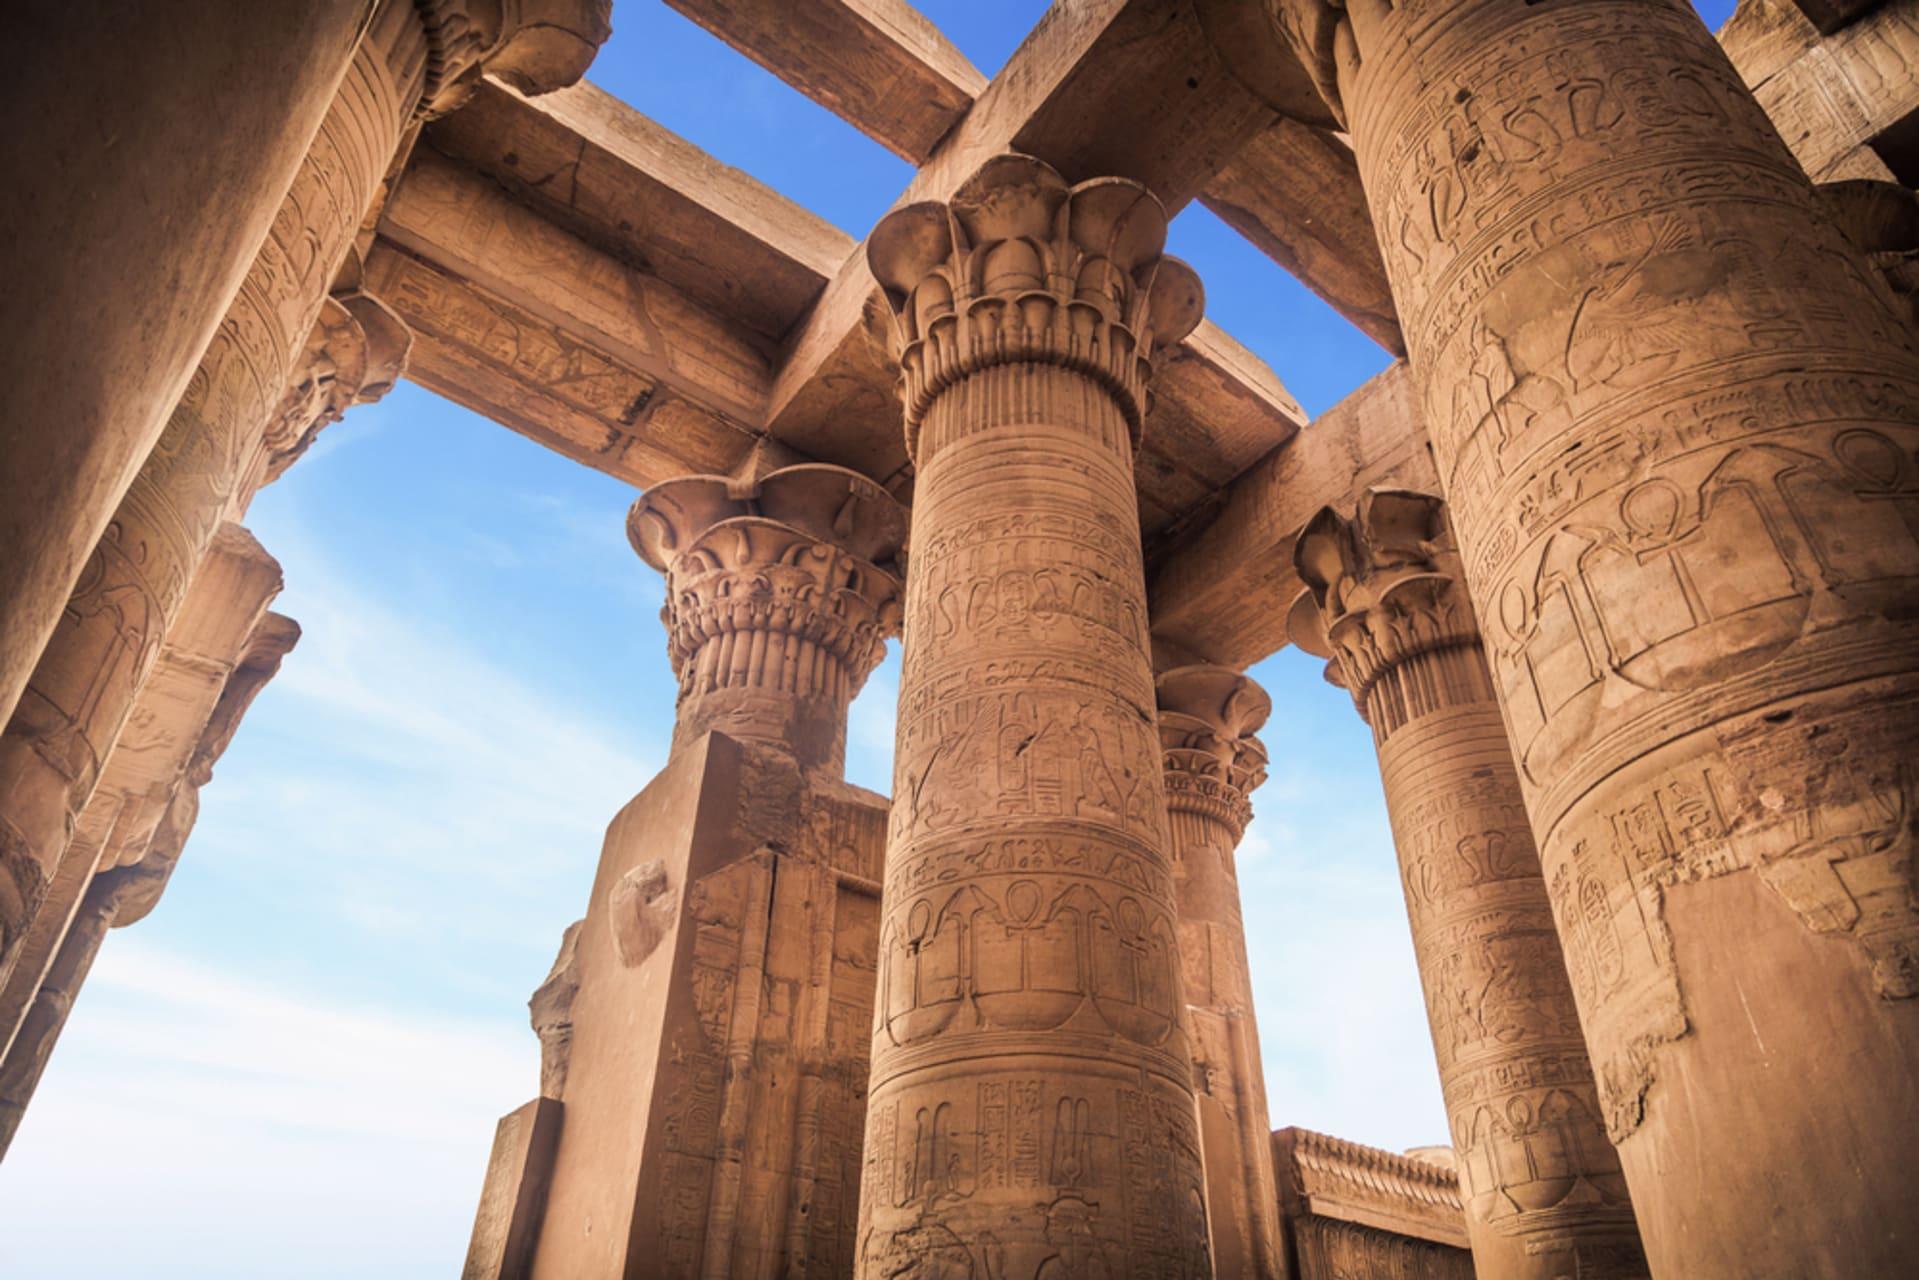 Aswan - Kom Ombo Temple and the God Sobek